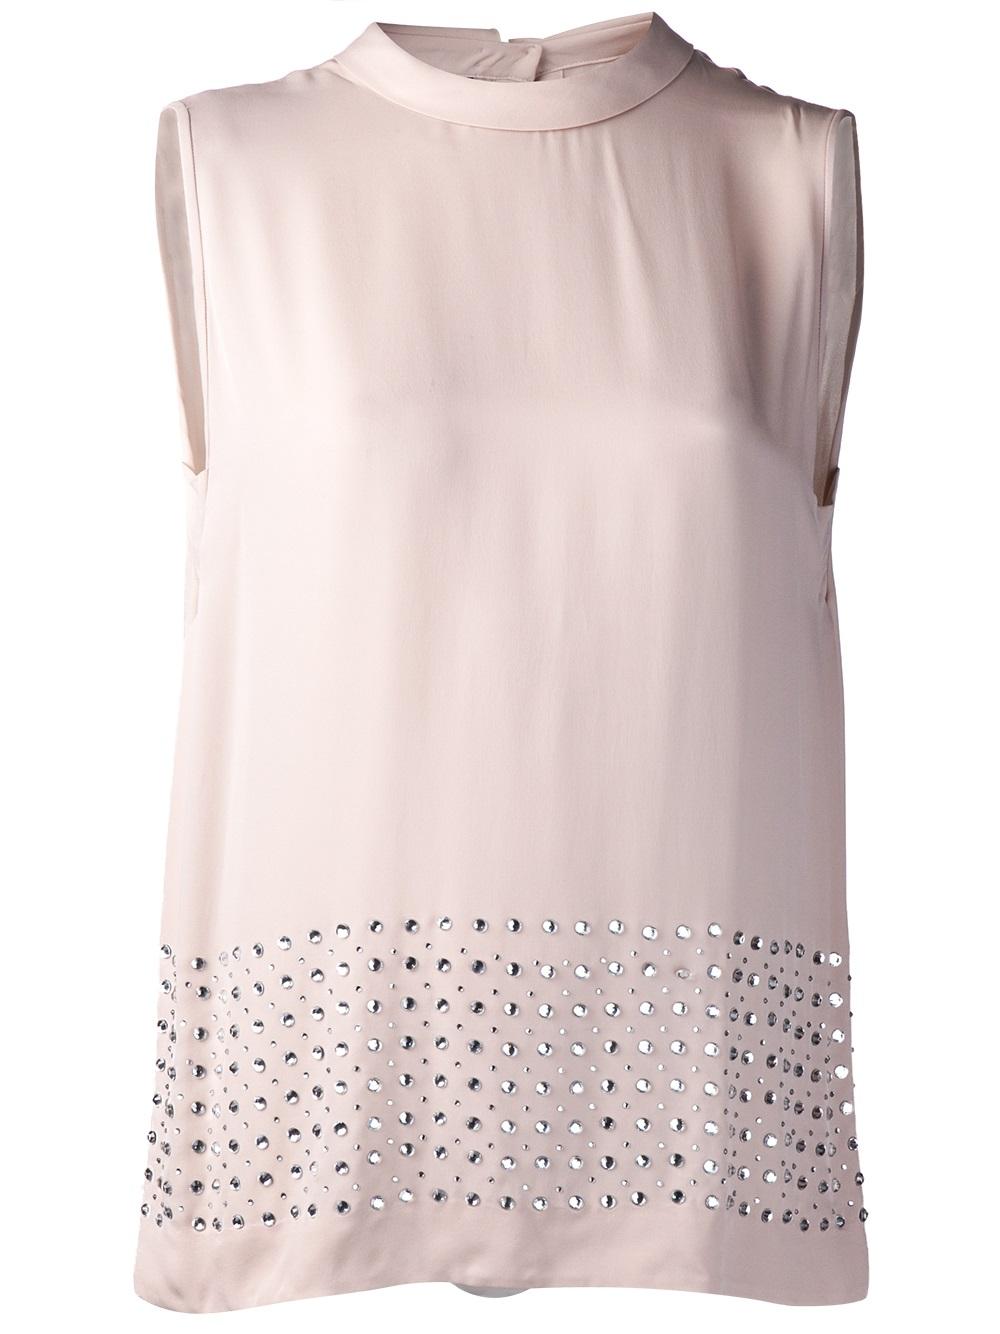 floral shirt dress - Nude & Neutrals By Malene Birger KcpmvYhBs